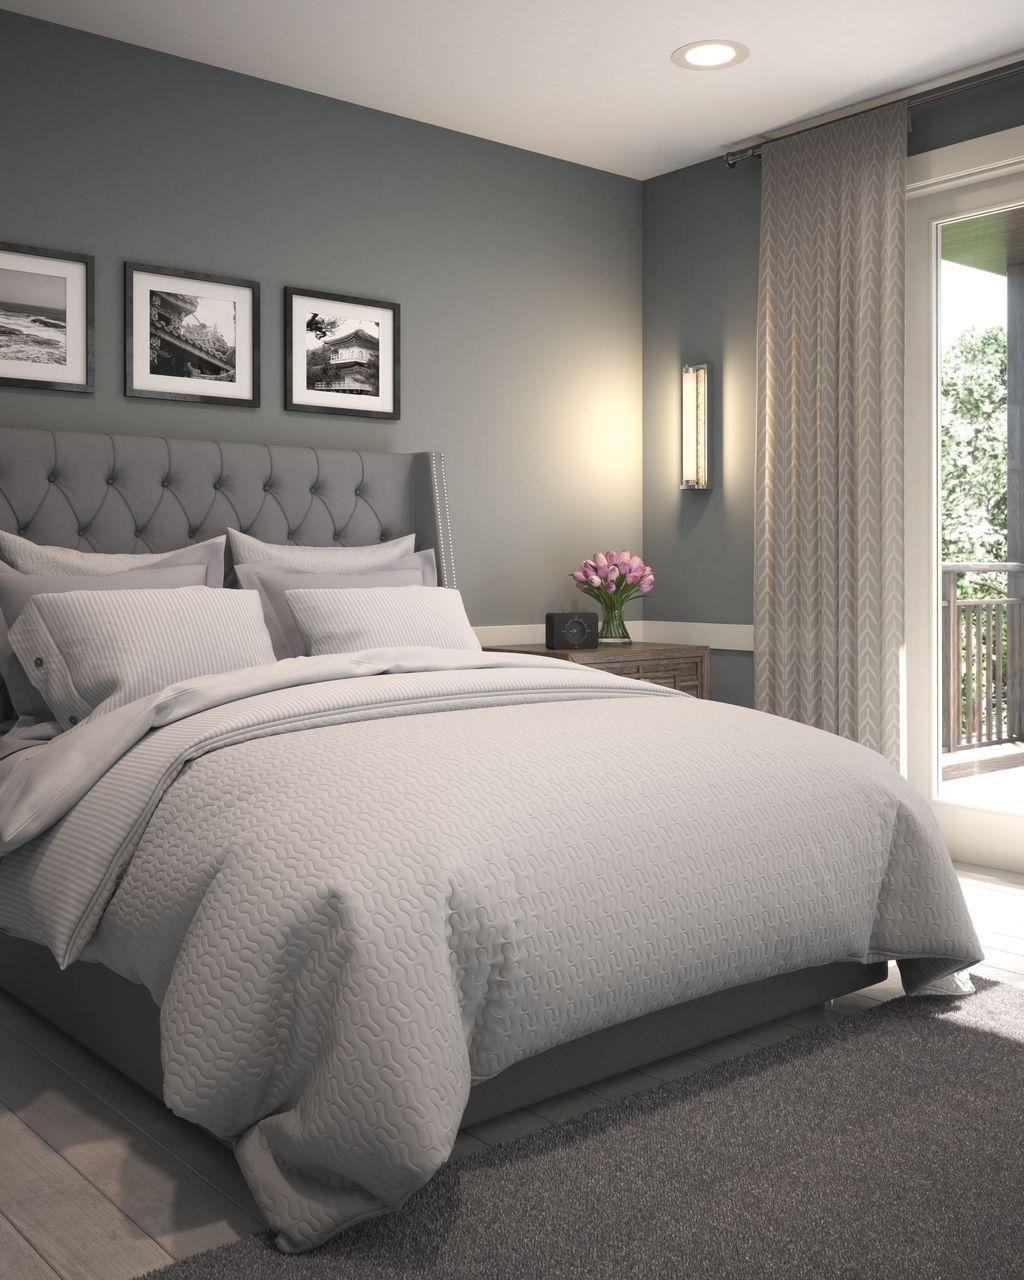 44 Stunning Grey Bedroom Decor Ideas Roledecor In 2020 Grey Bedroom Decor Master Bedrooms Decor Small Master Bedroom